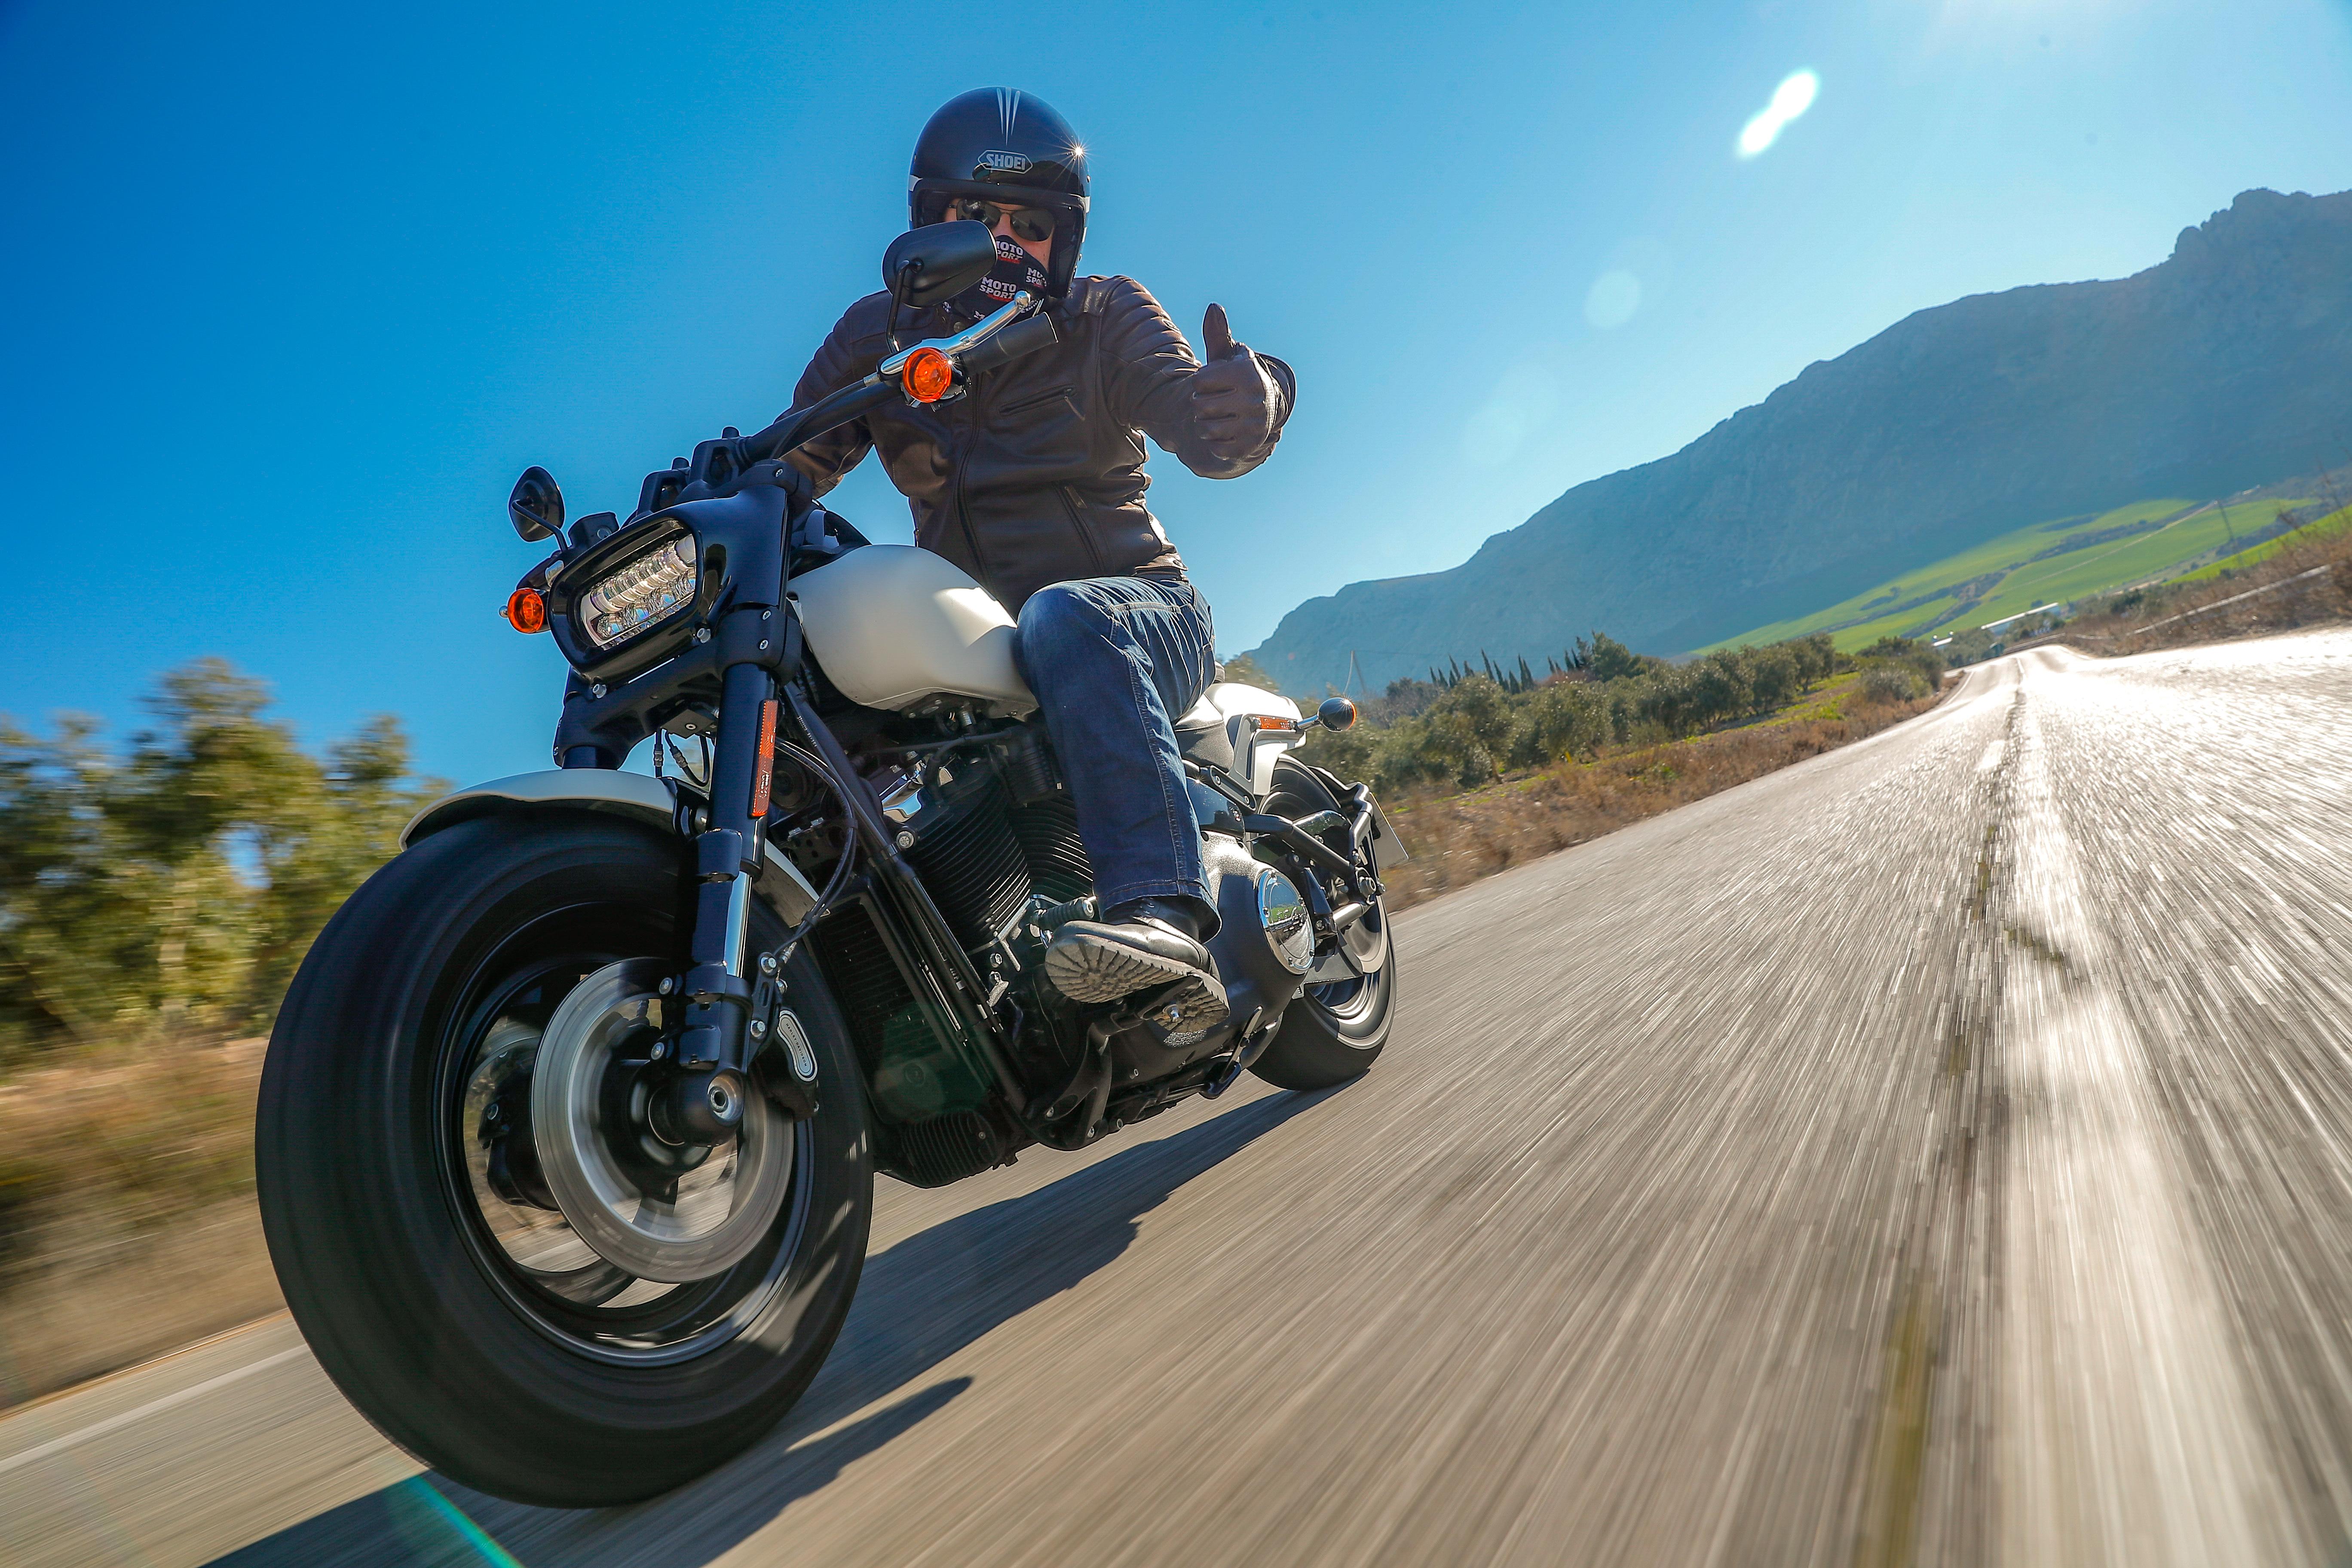 Harley Davidson Fat Bob gants blouson IXS 114 ActuMoto Mathias Deshusses